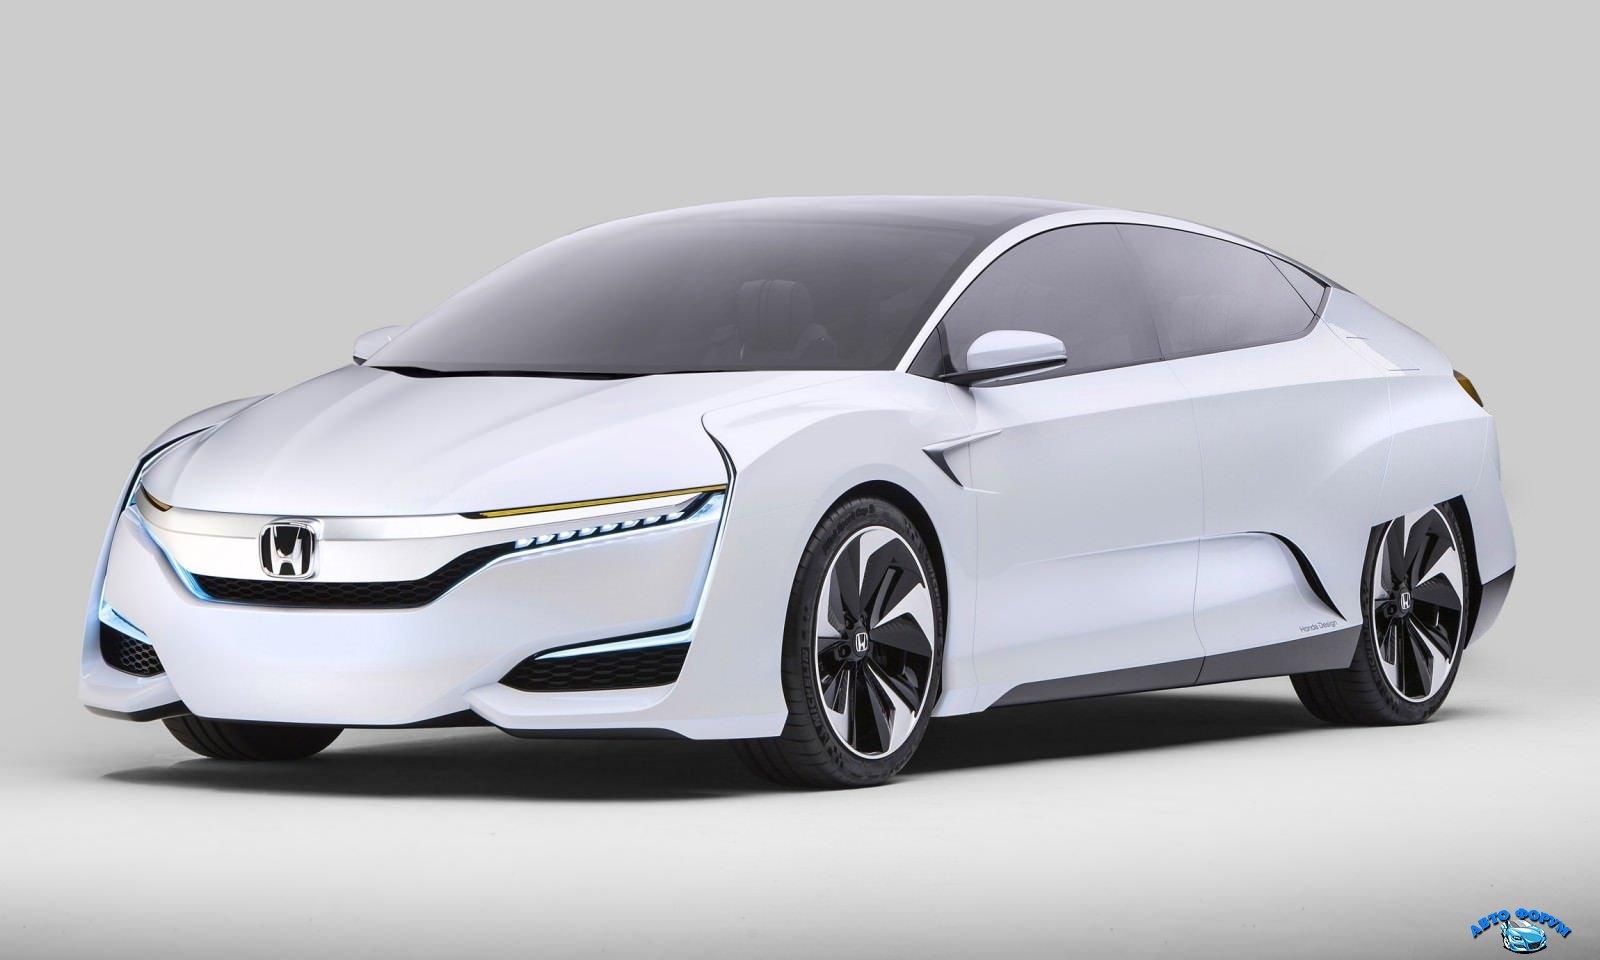 2015-Honda-FCV-Concept-16-copy-1600x960.jpg